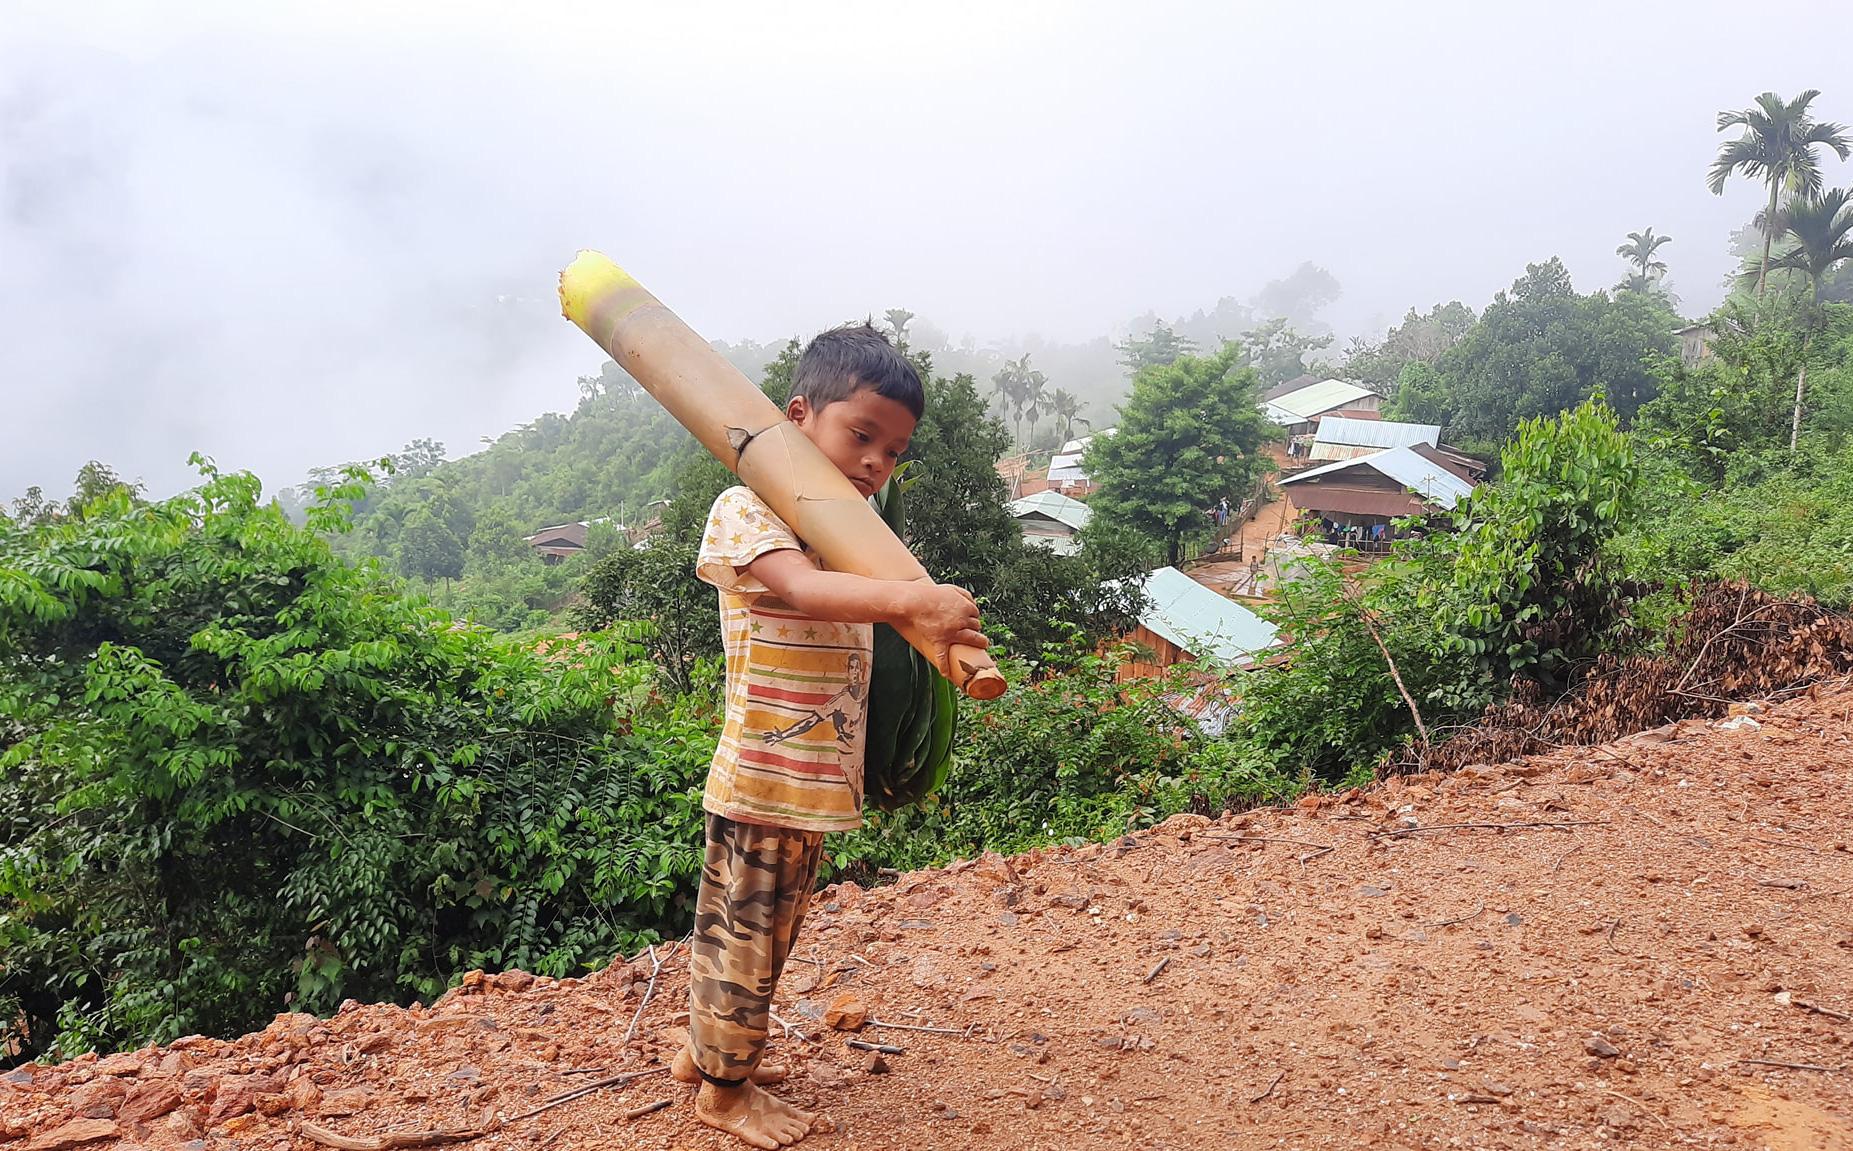 Vietnamese boy carrying forest bamboo shoot to support Da Nang, COVID 19 hotspot